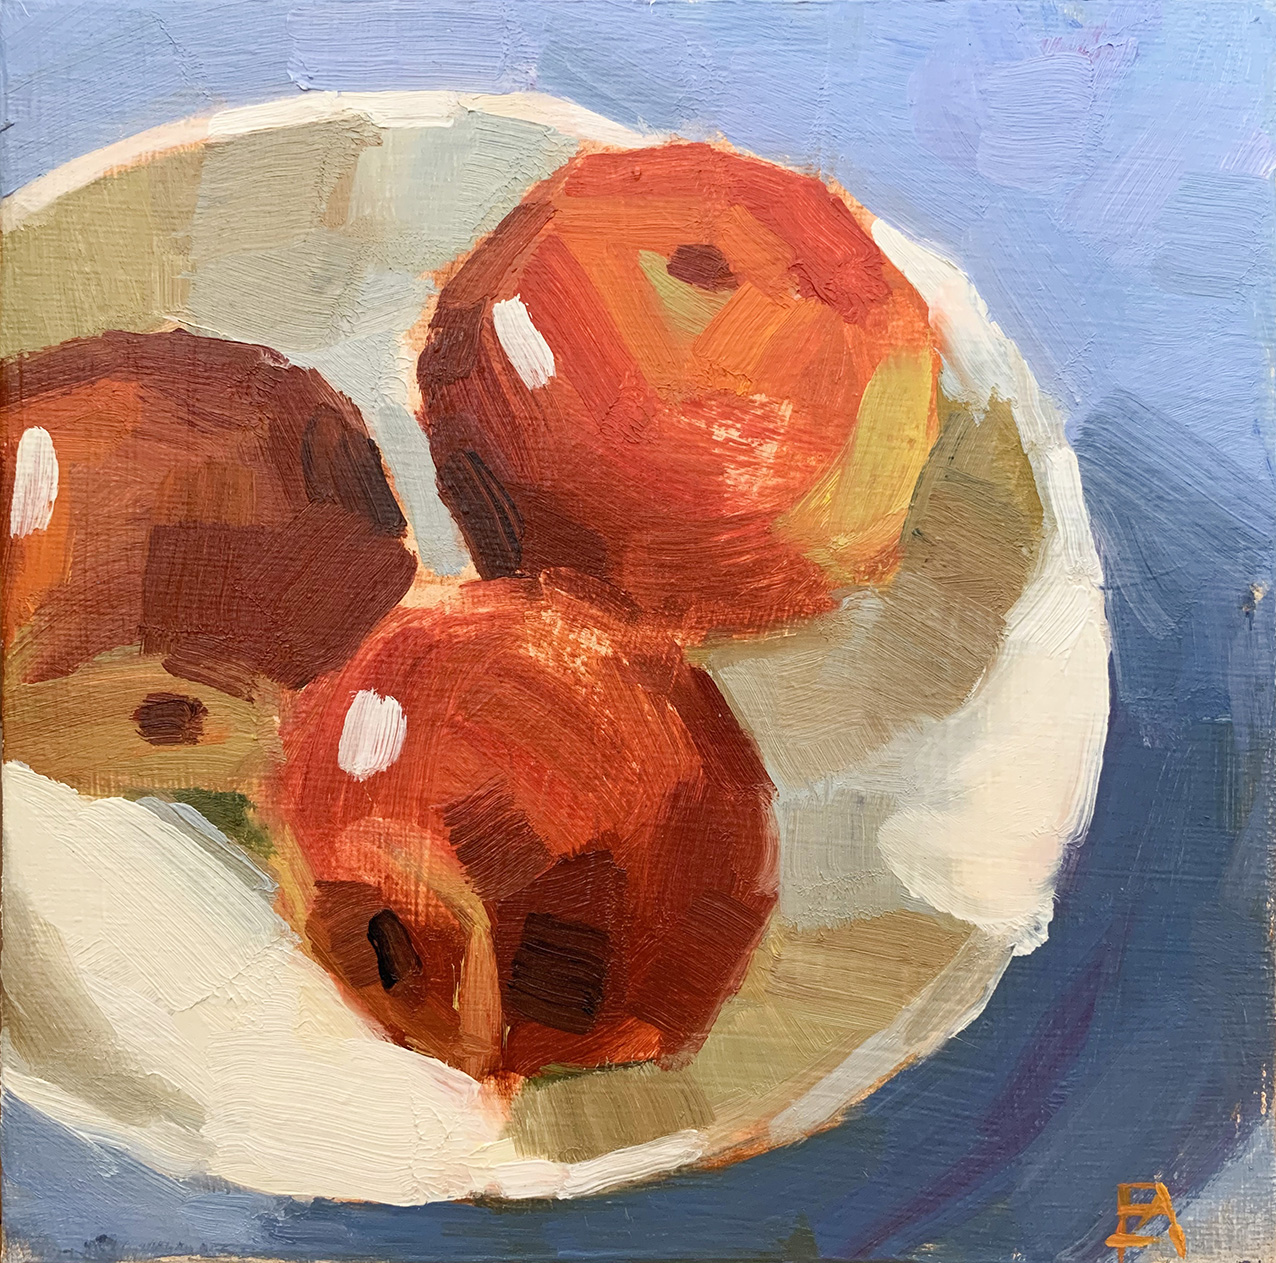 Three Apples   Oil on canvas 20 x 20 cm  2019